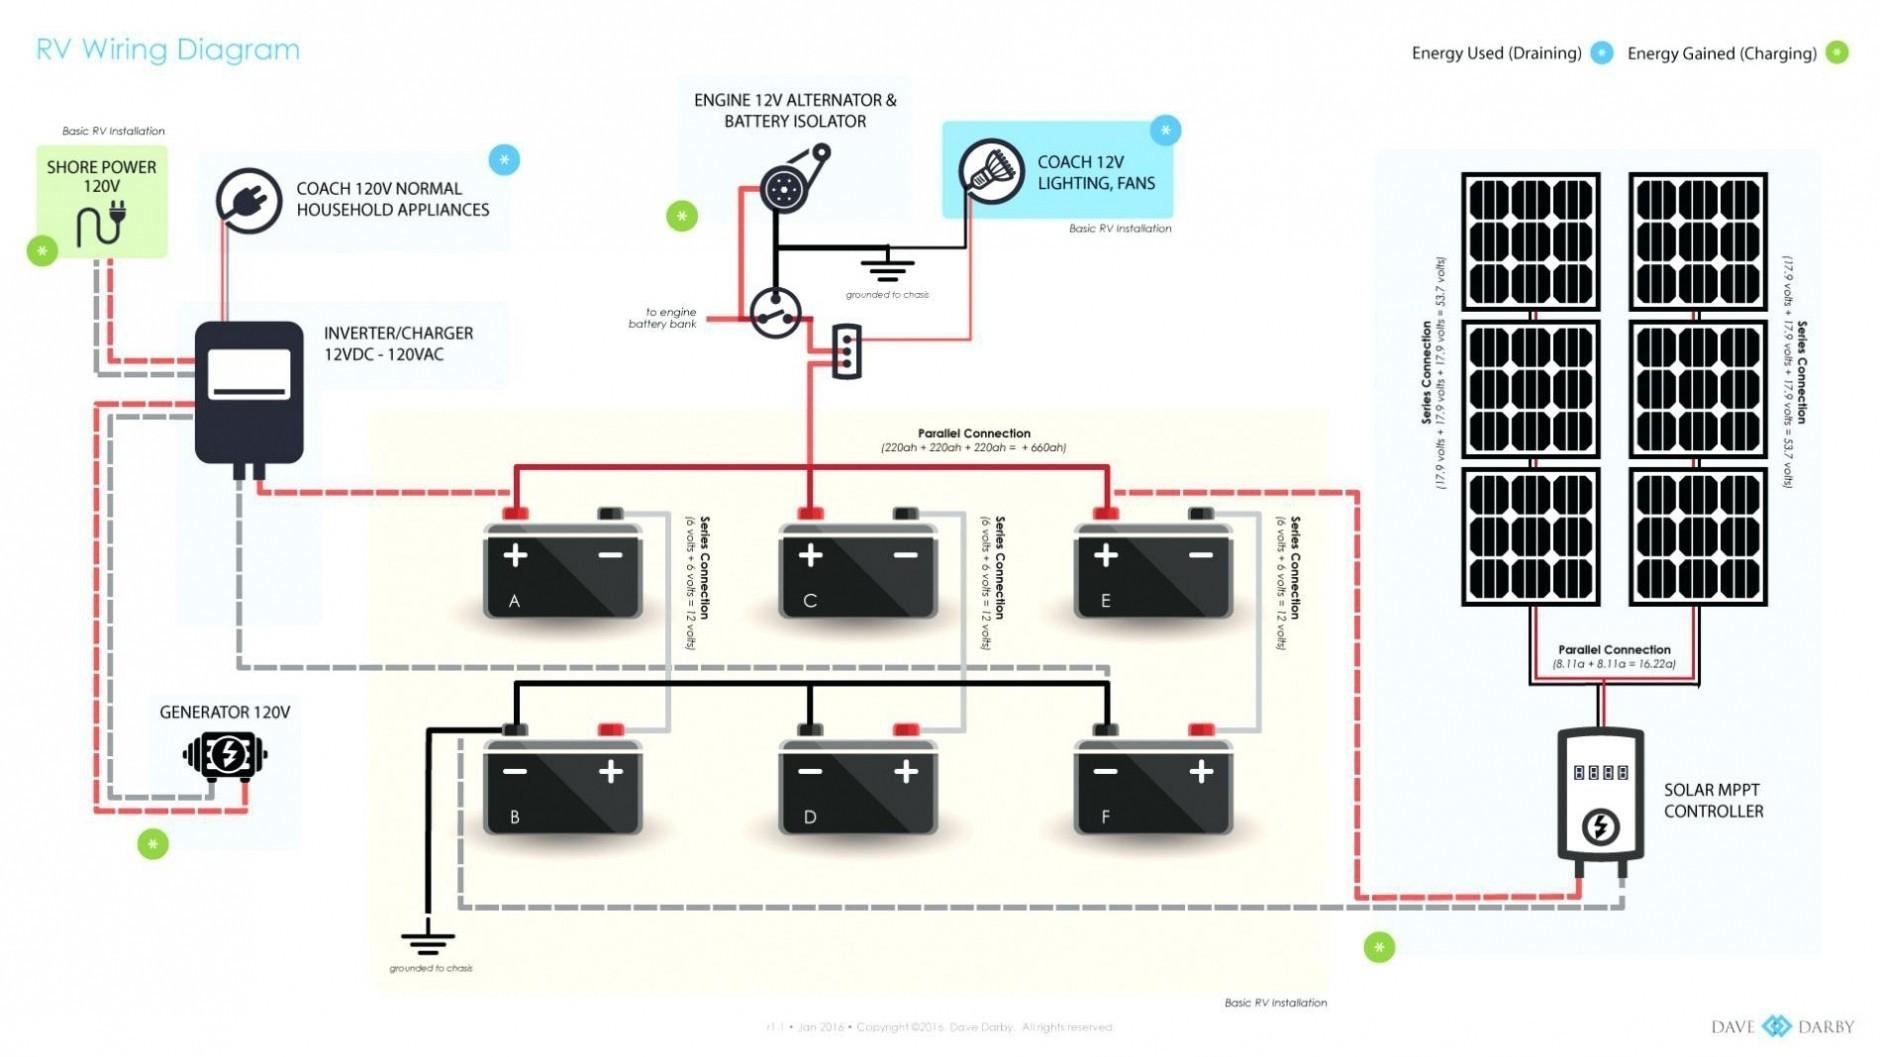 Fleetwood Bounder Rv Wiring Diagrams | Schematic Diagram - Fleetwood Rv Wiring Diagram